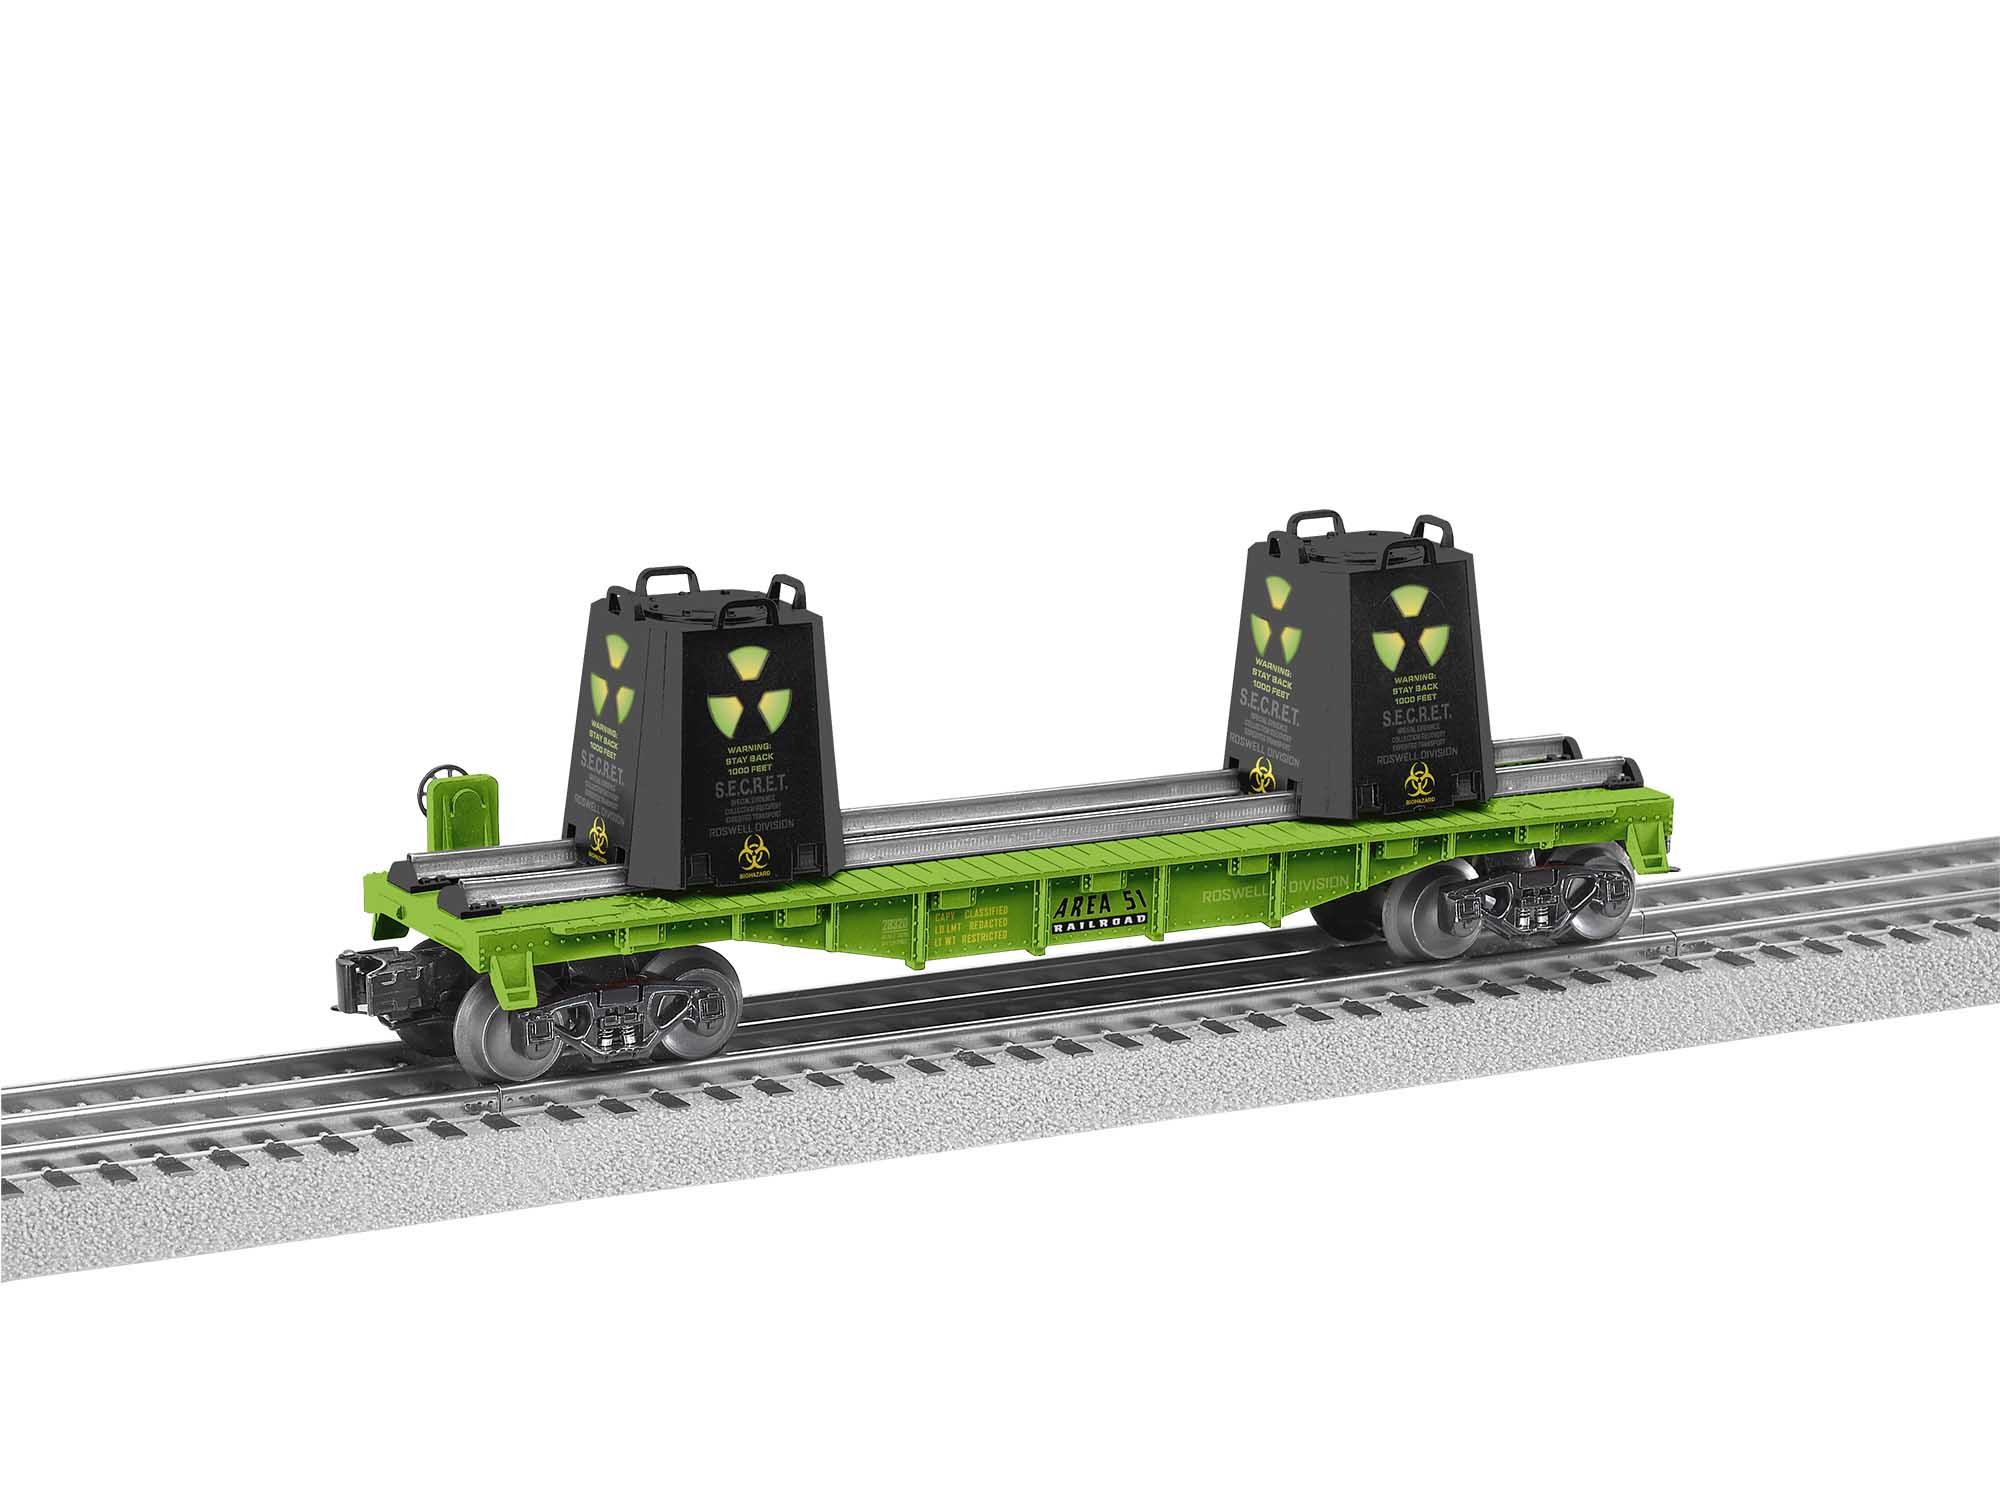 Lionel 2028320 O27 Flatcar Alien Radioactive